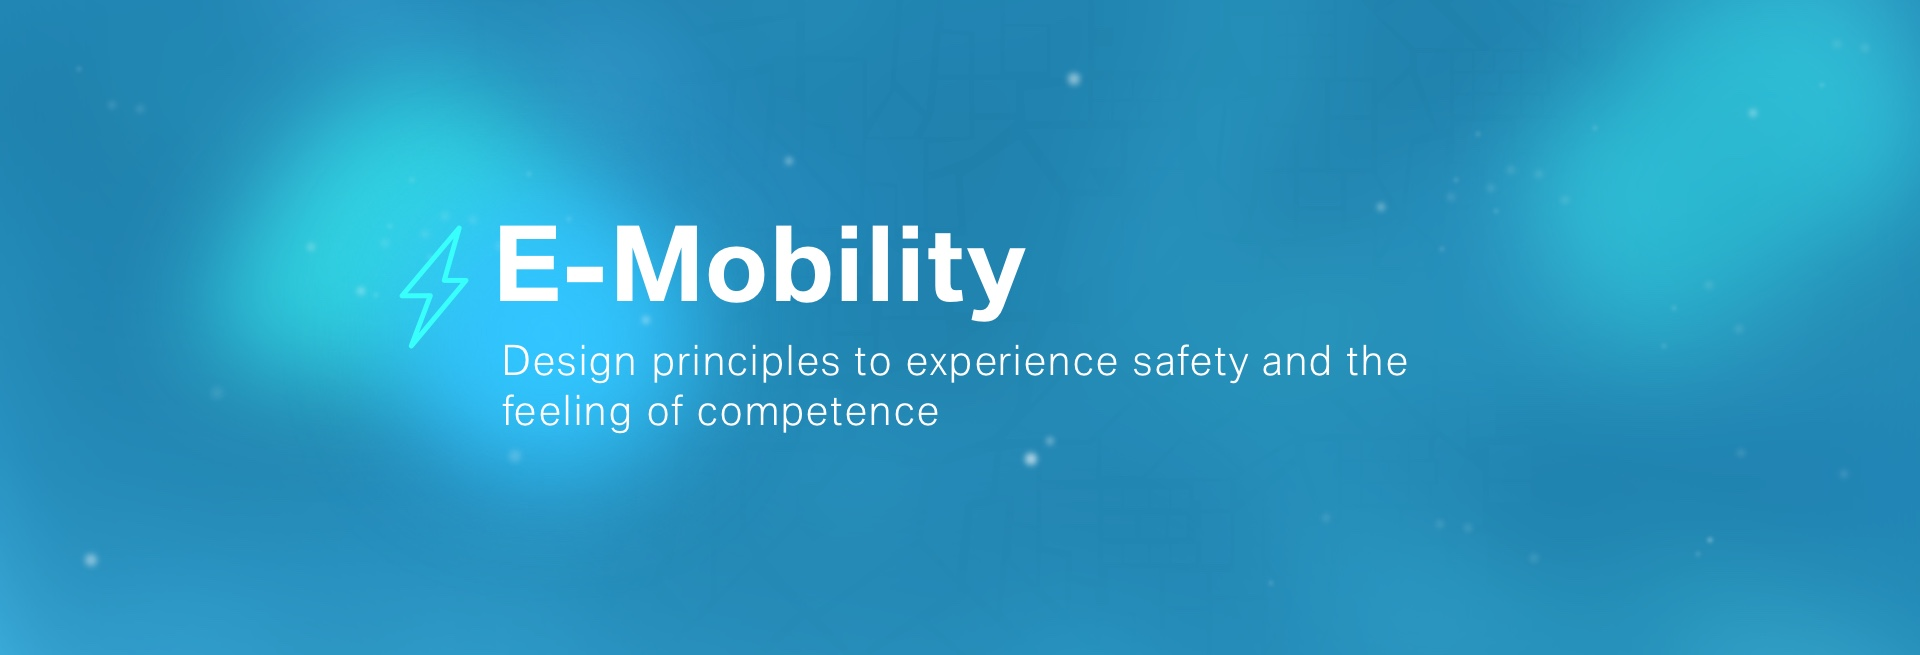 E_mobility_startbild